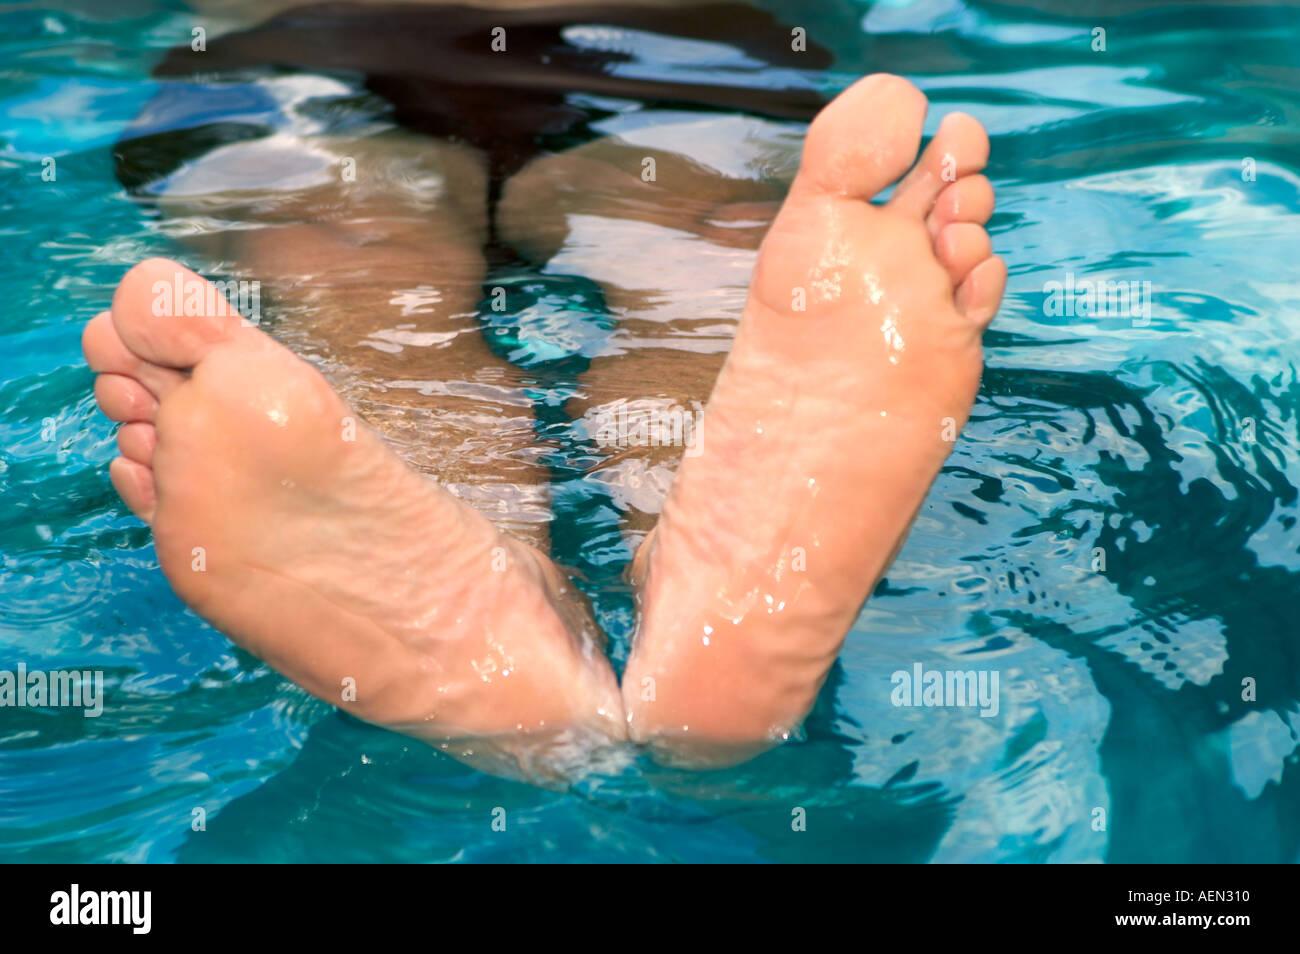 Ad Naked